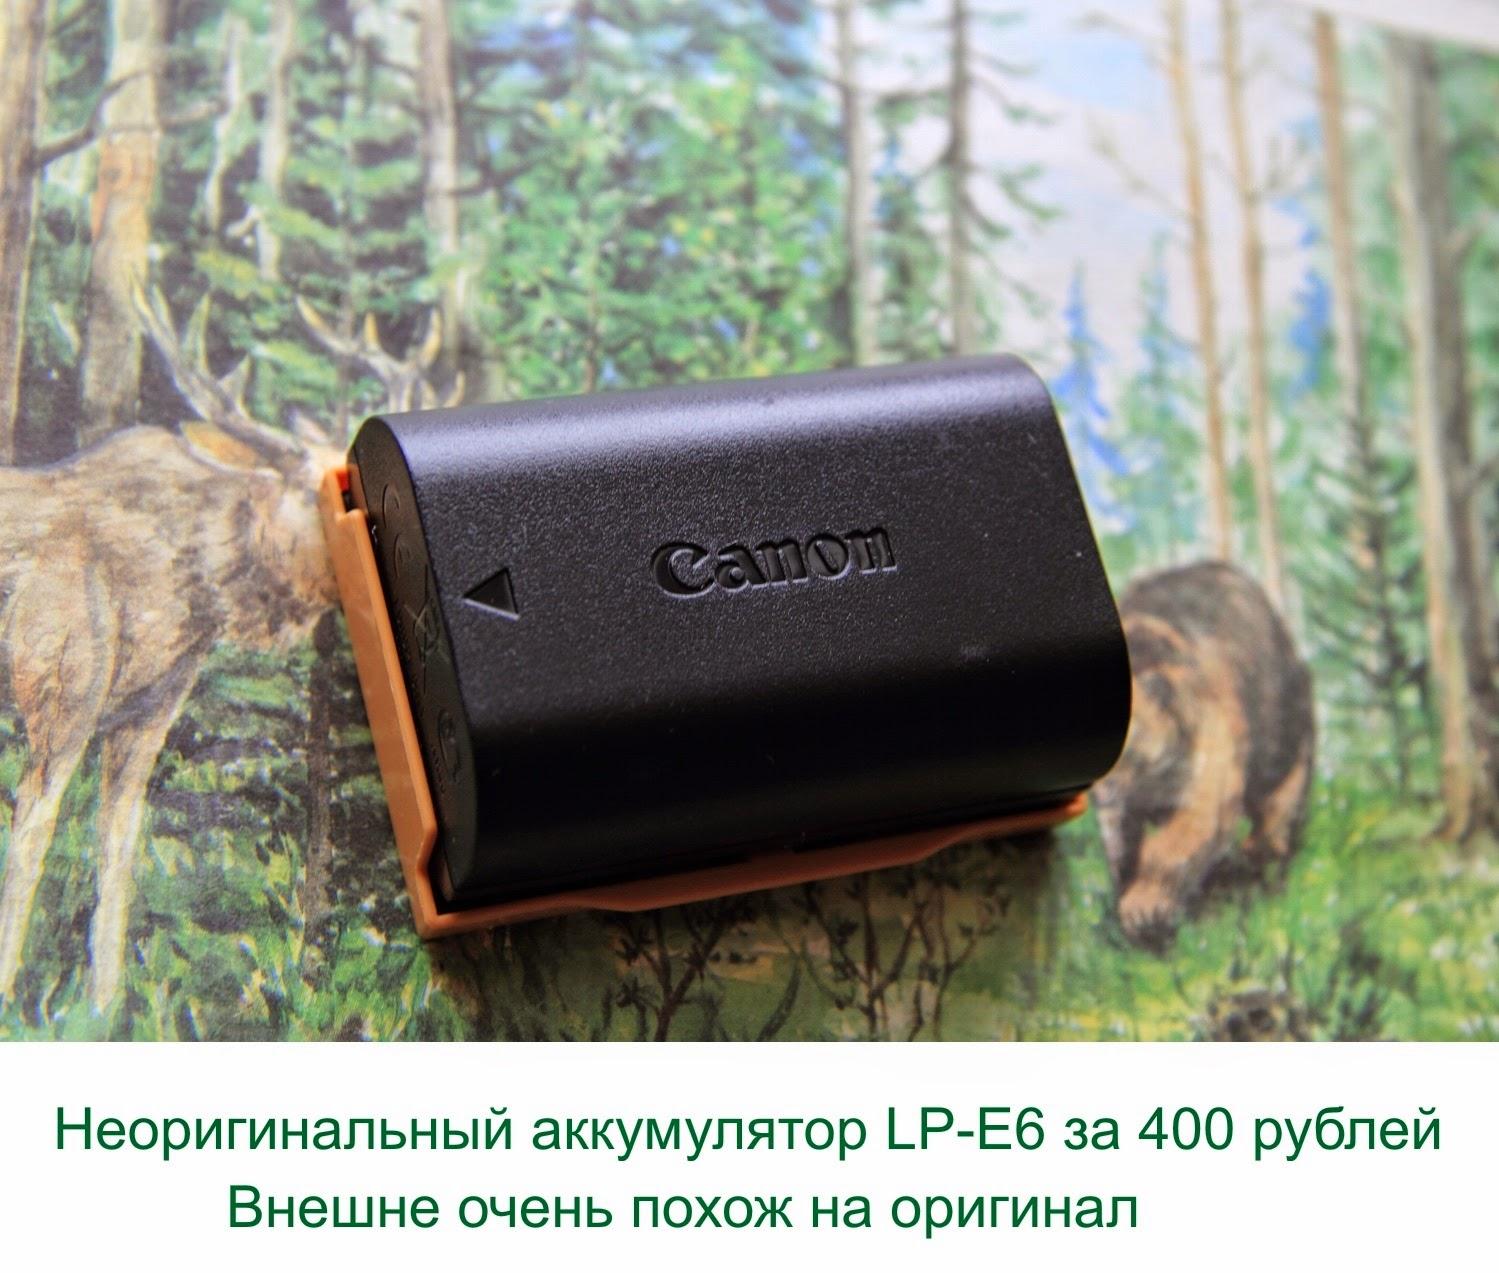 ФотоВидеоБраконьер - фото и видеоуроки для начинающих ...: http://fotovideobrakoner.blogspot.com/2014/03/obzor-akkumuljatora-dlja-canon-lp-e6-originalnogo-i-kitaiskogo.html